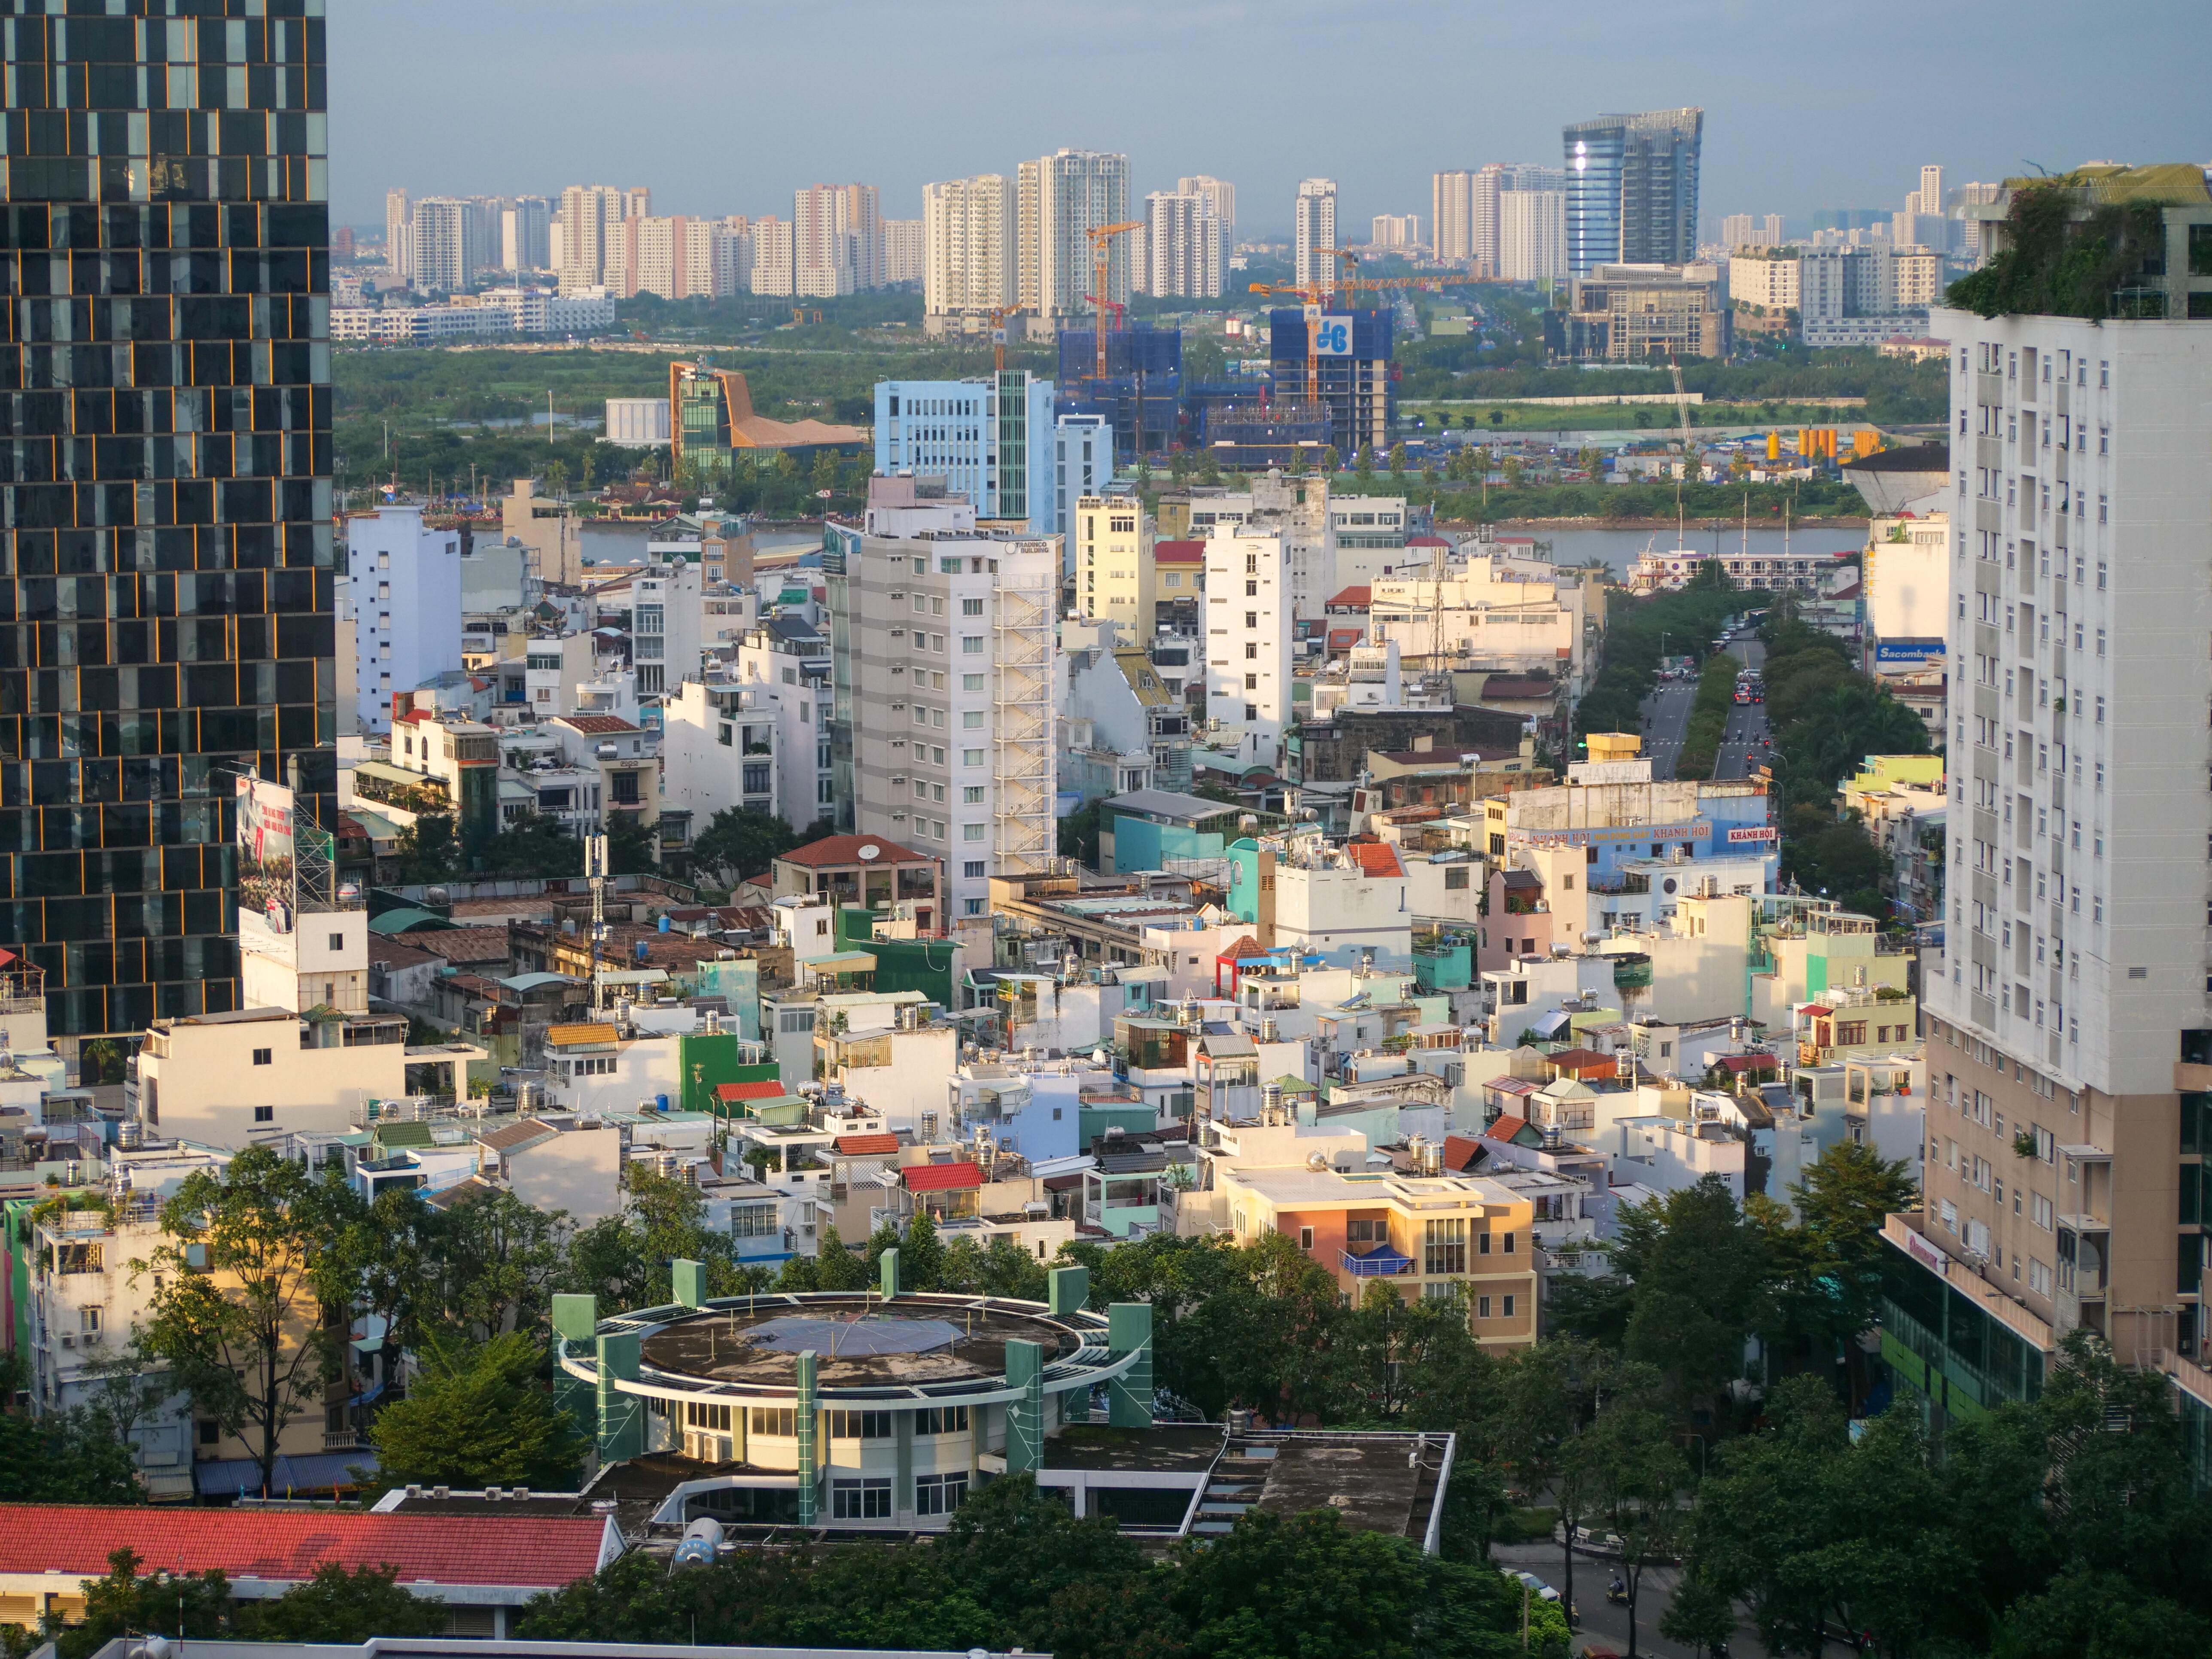 Saigon Ho Chi Minh City vu du ciel